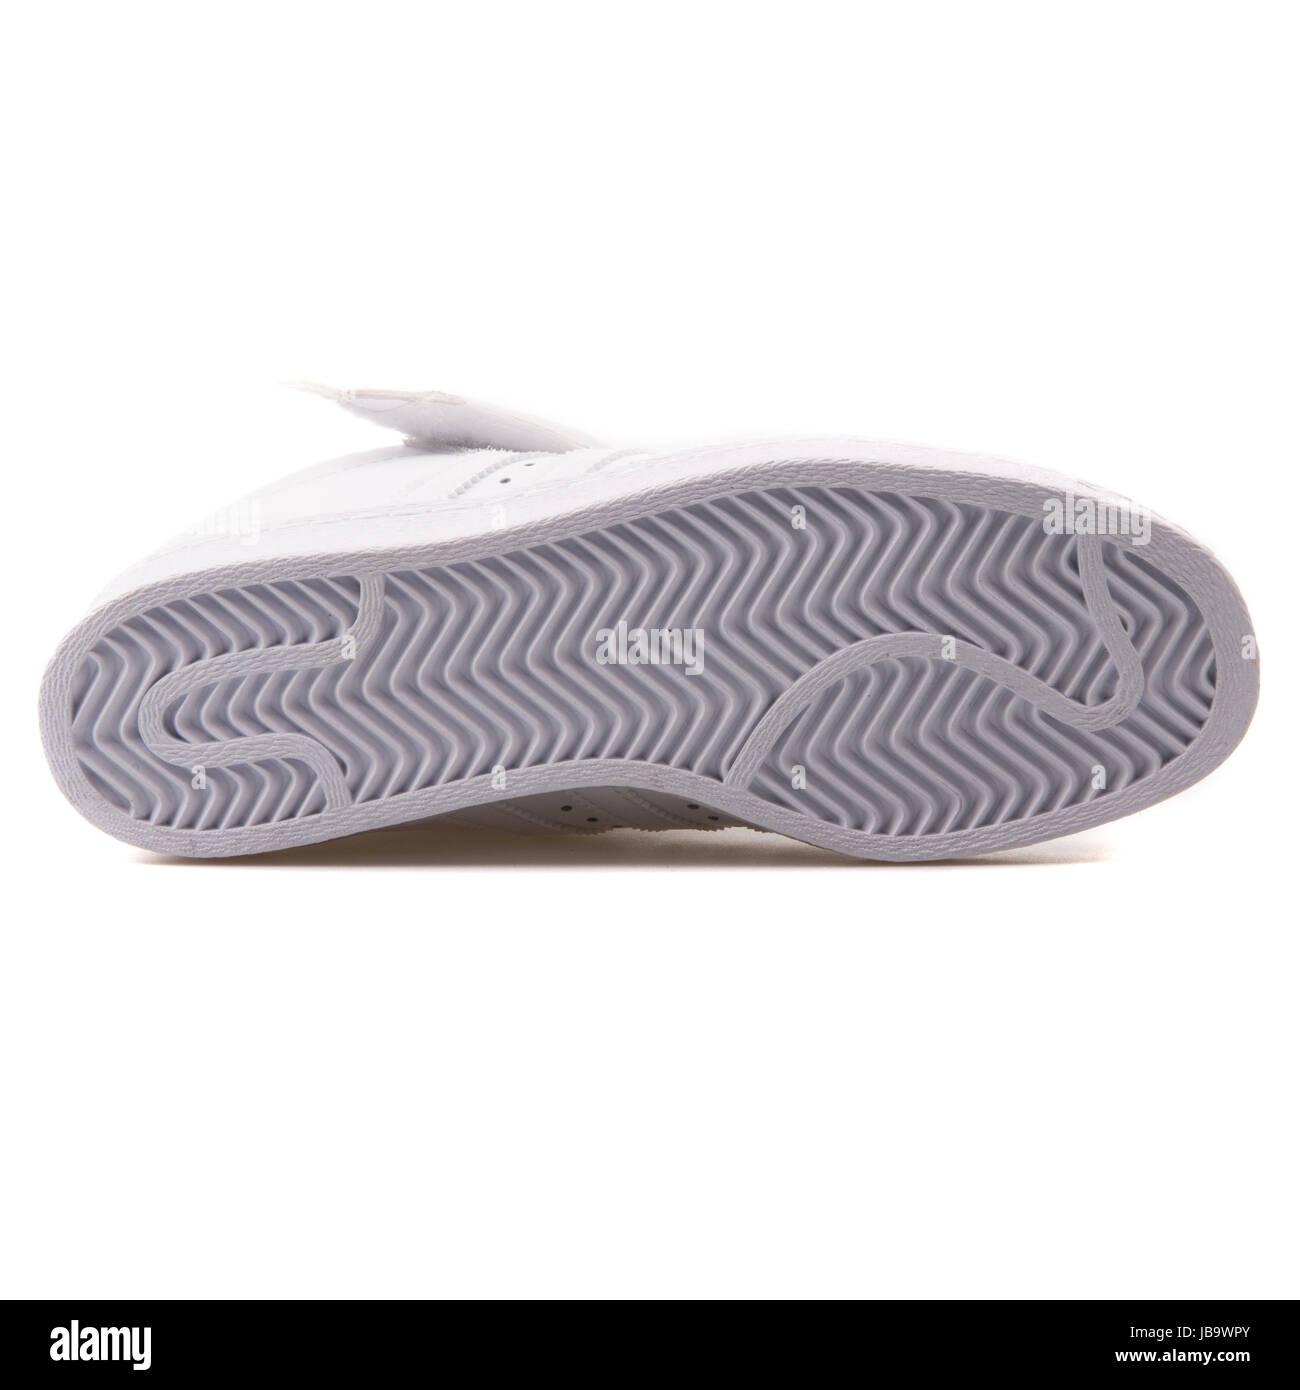 new concept 7a835 1e02a Adidas Superstar pletina W Blanco zapatos de mujer - S81351 Imagen De Stock